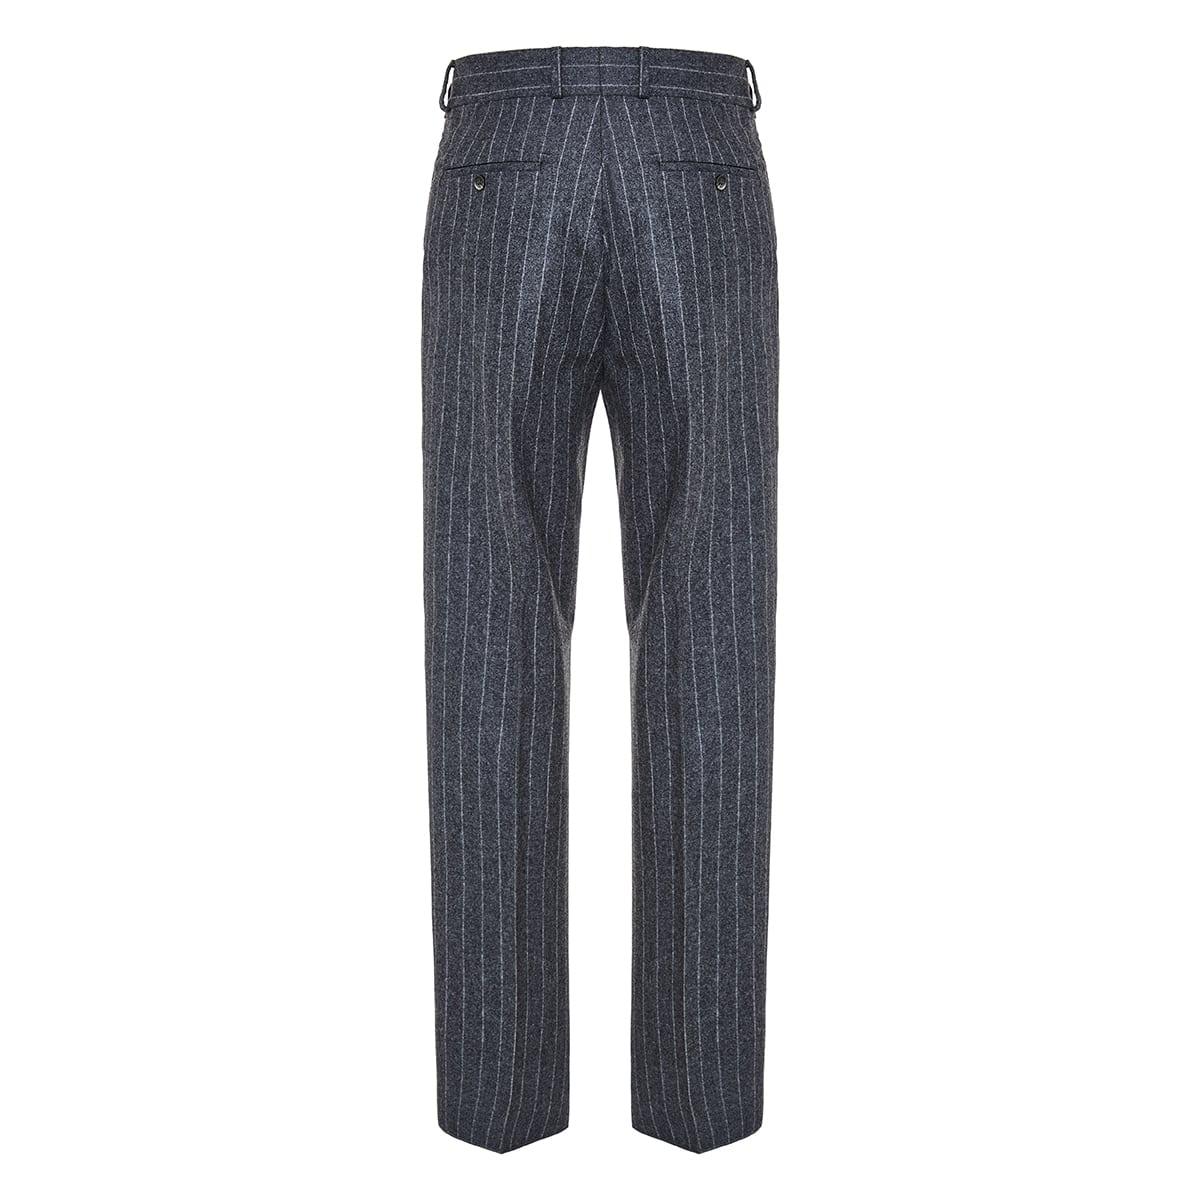 Pinstripe flannel trousers